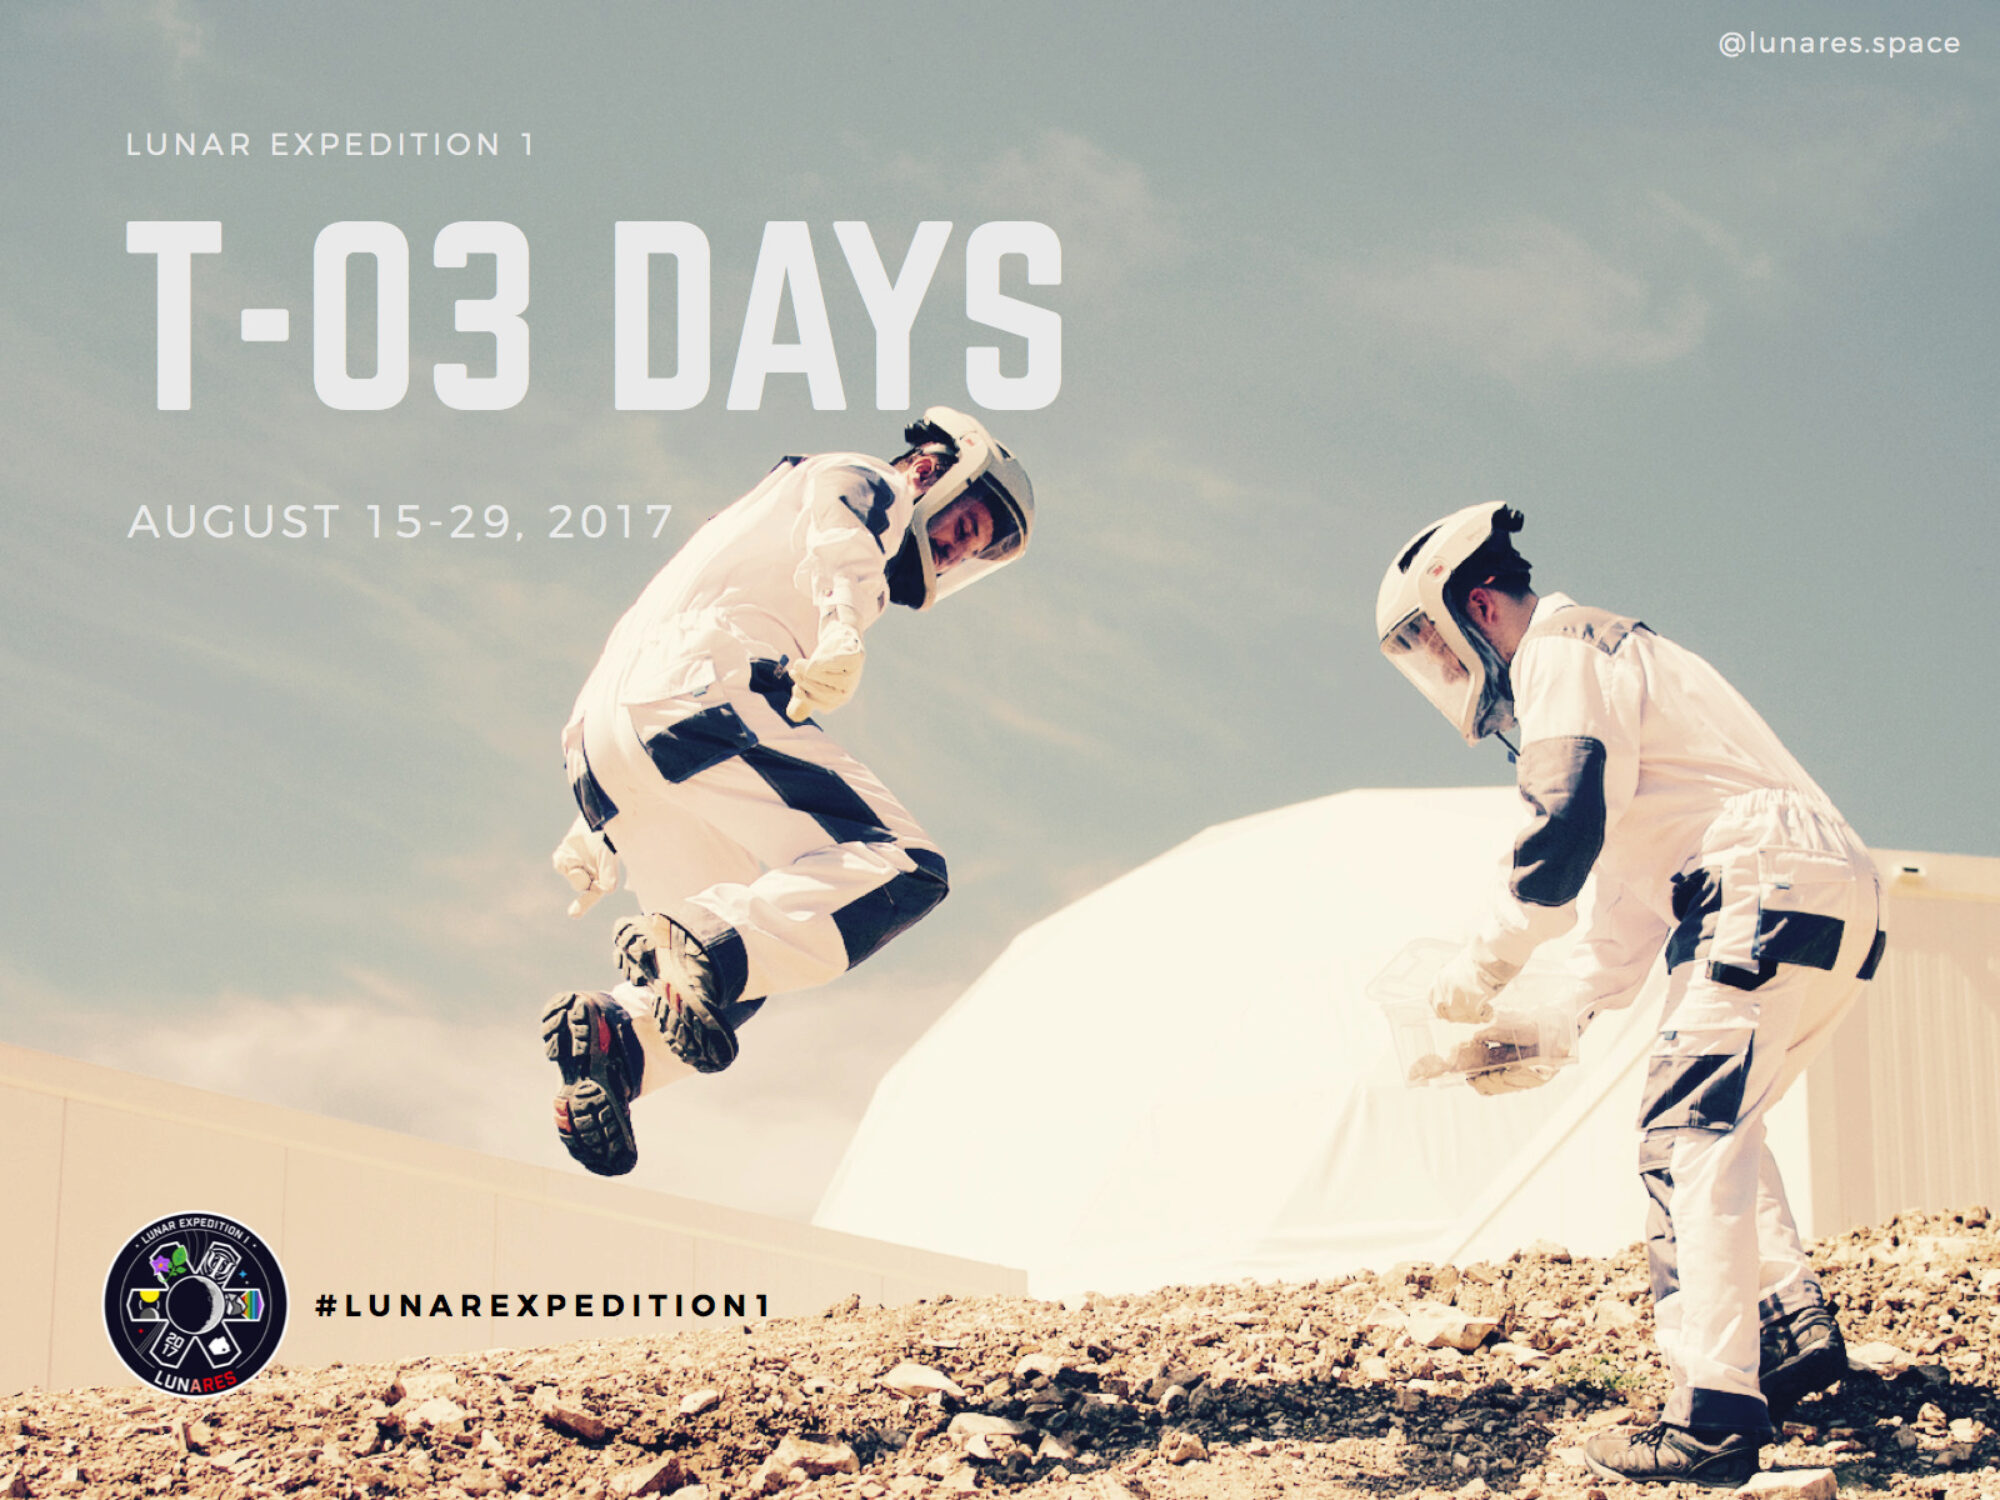 lunar-expedition-01/T-03-Days.jpg